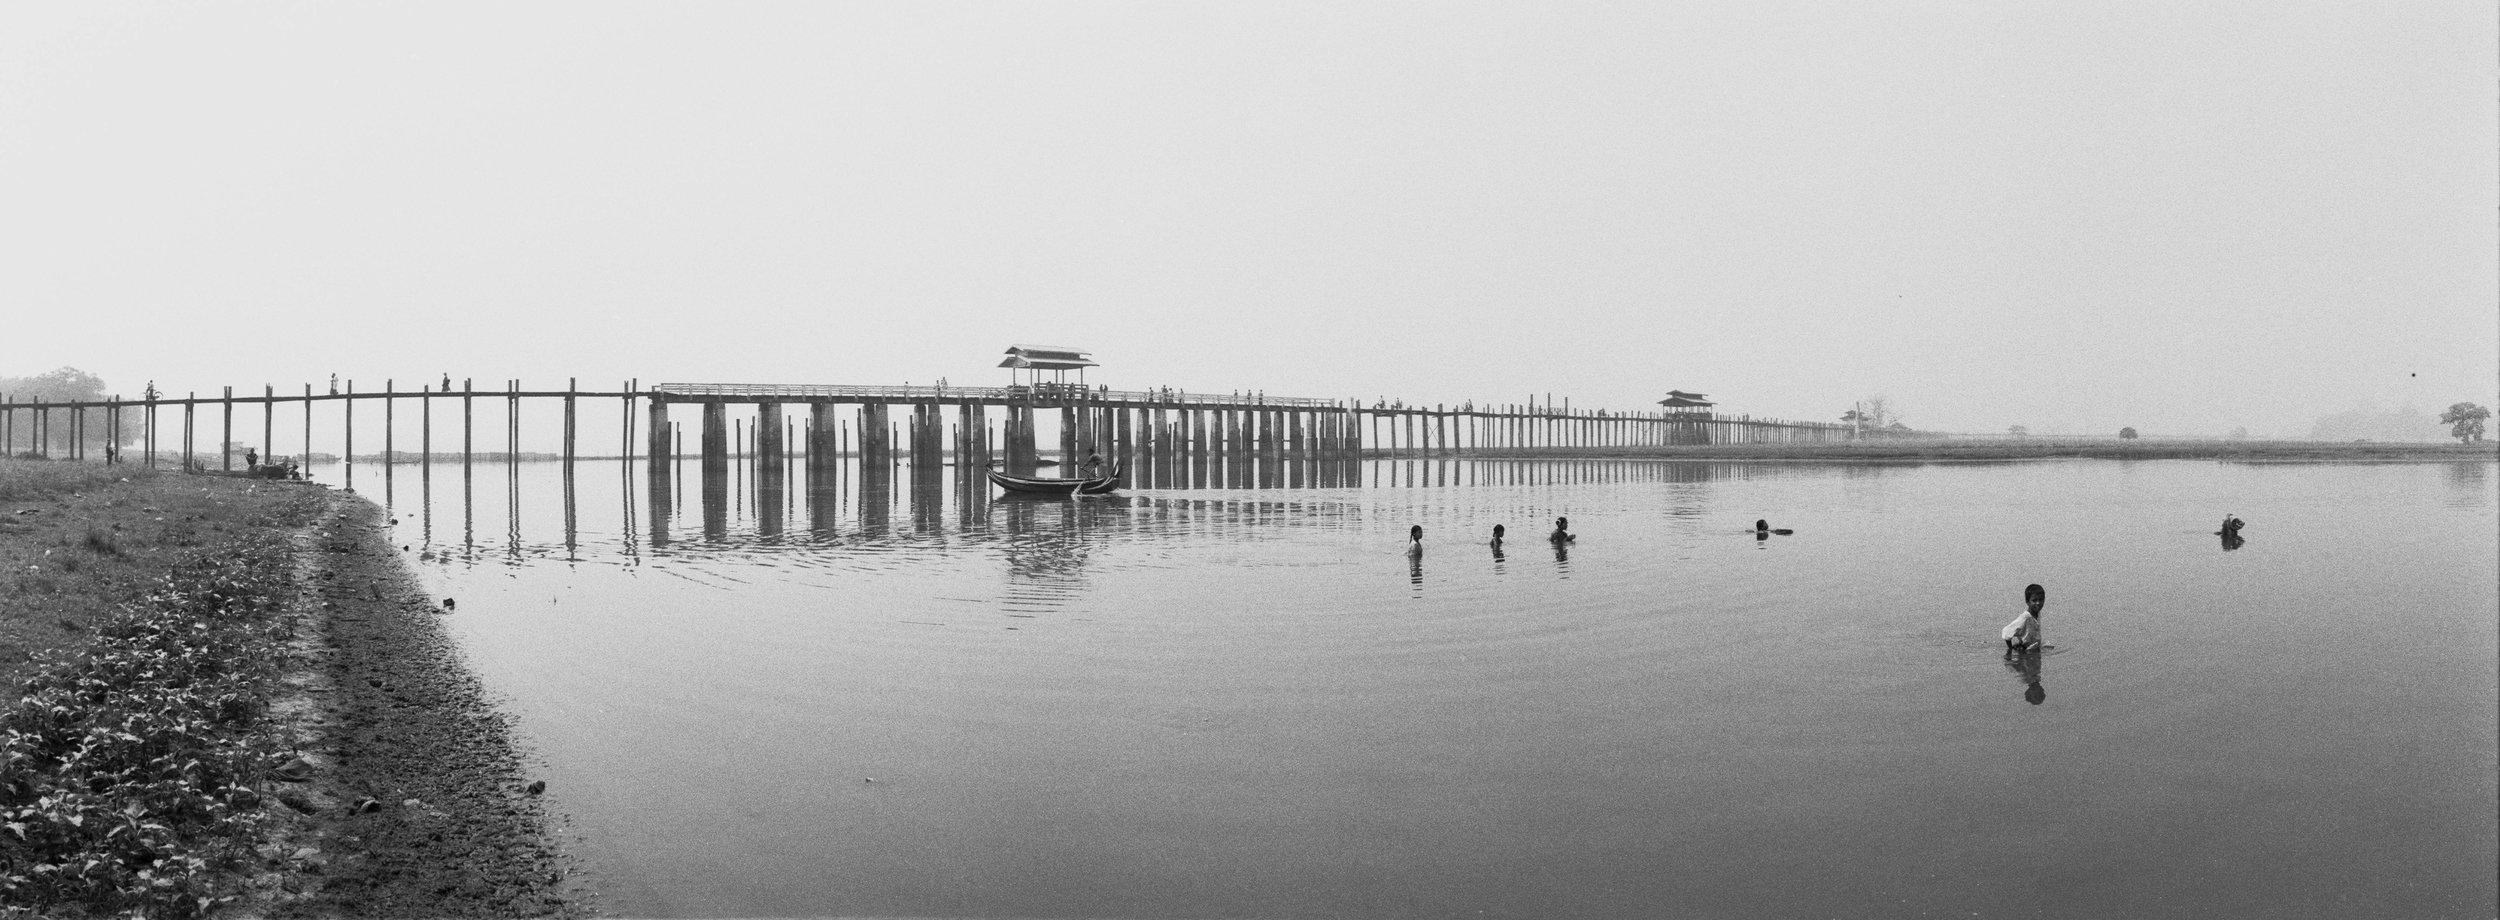 Mandalay, Burma 2003